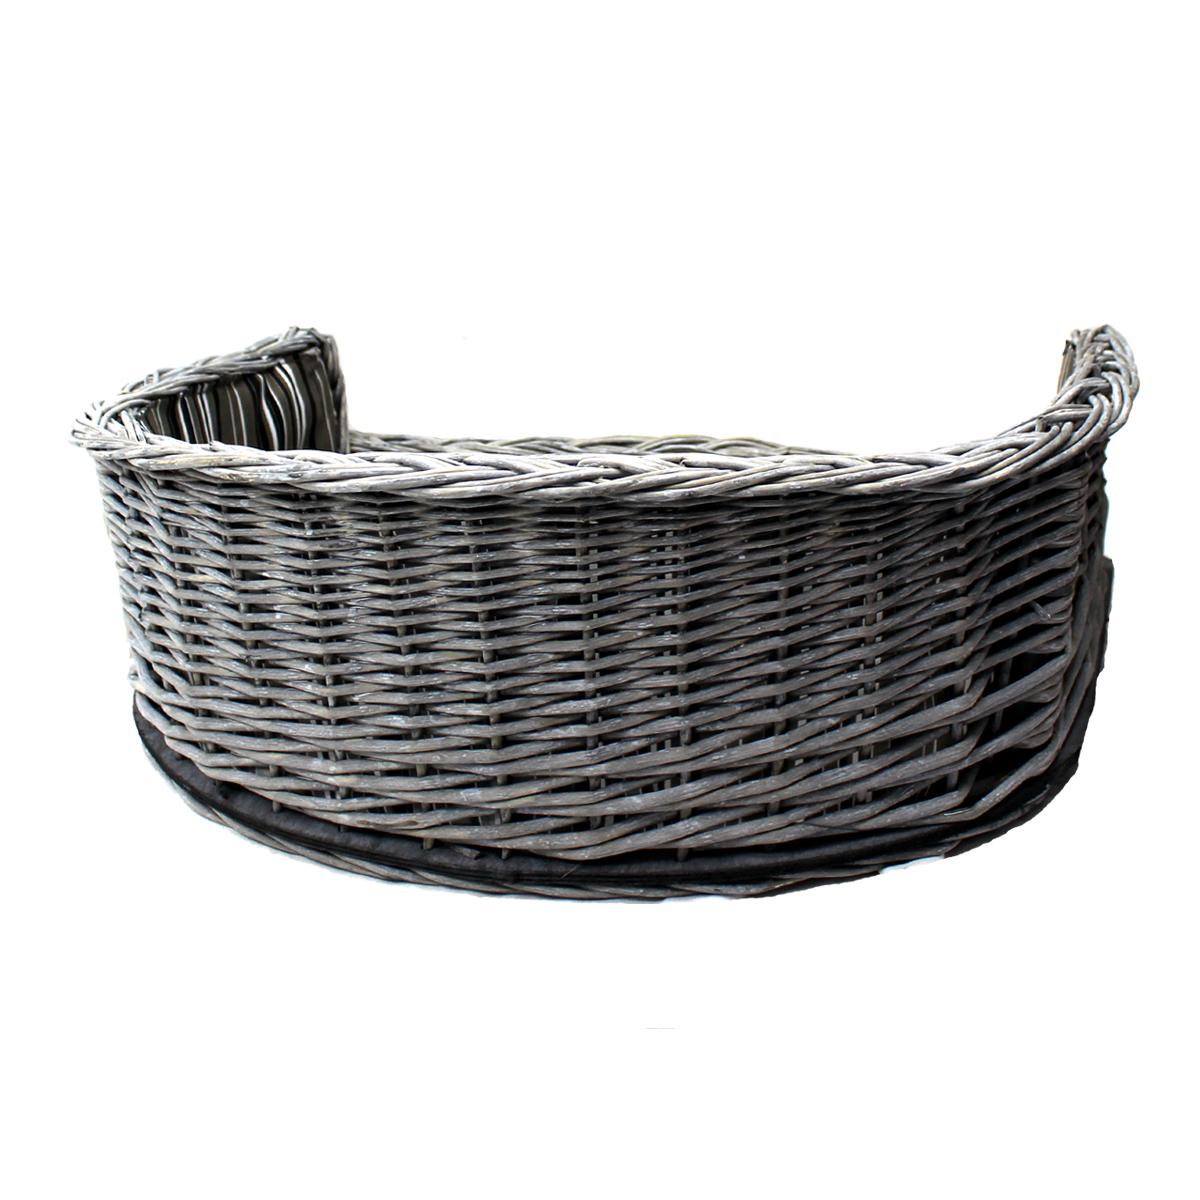 Handmade Wicker Dog Basket : Michur lisa dog cat basket cave bed rattan willow